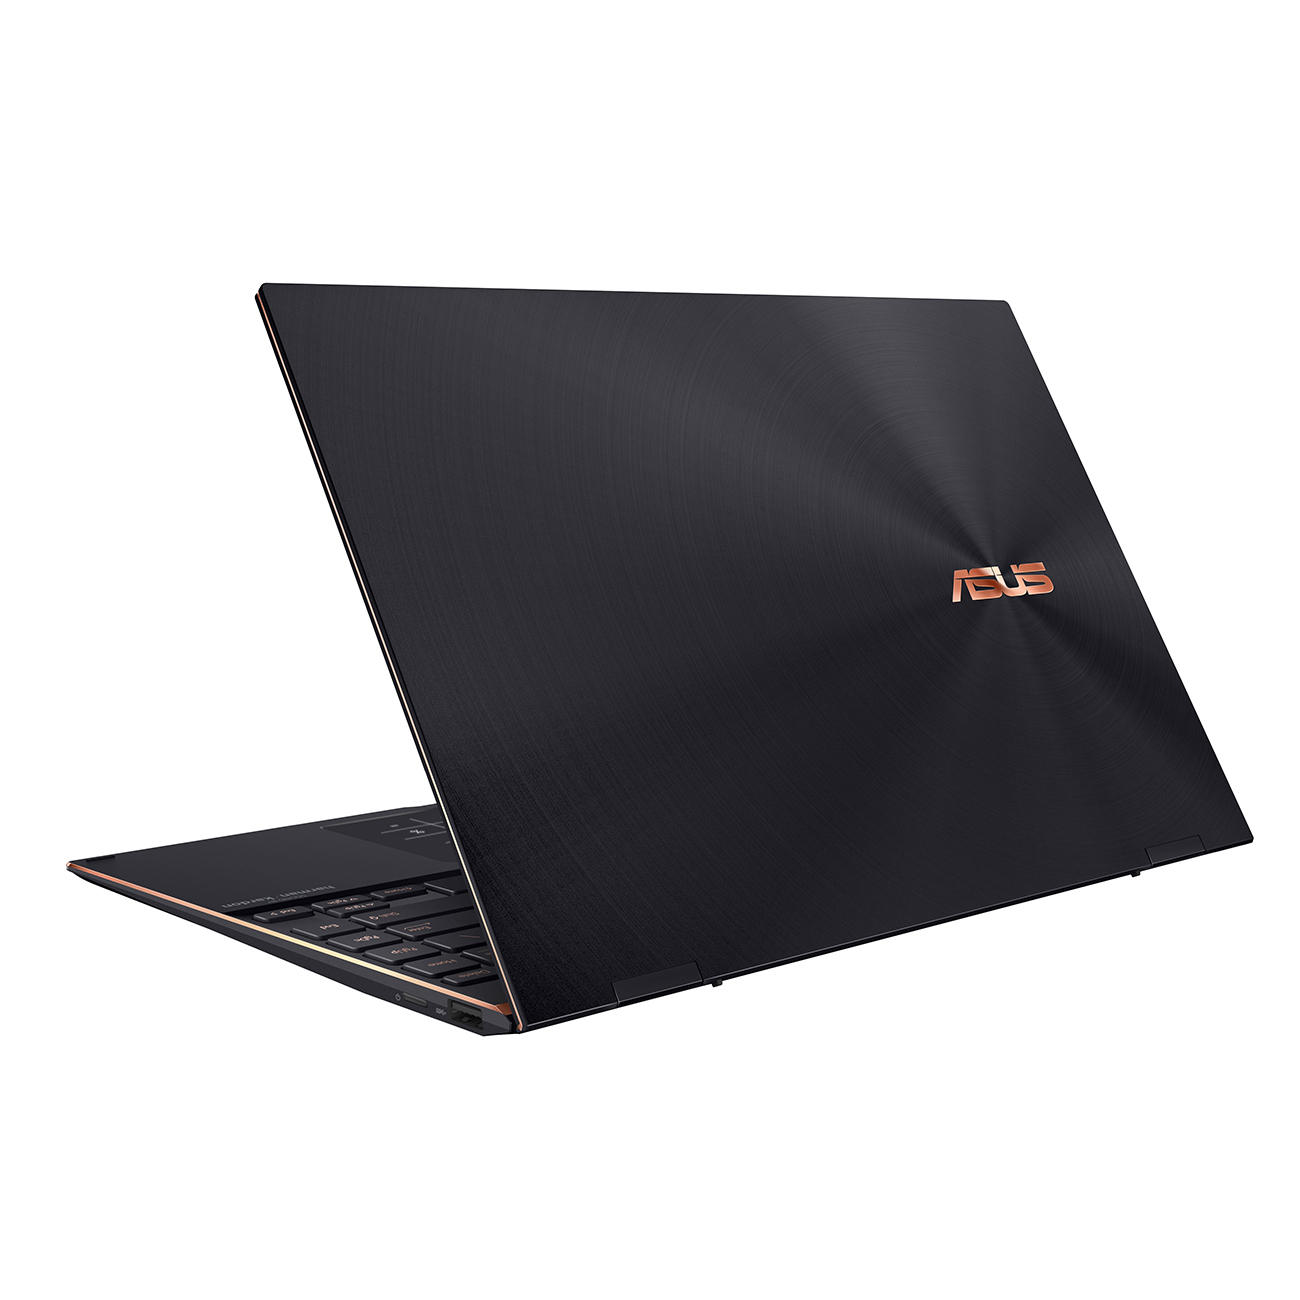 ZenBook Flip S_UX371_Product photo_2K_ Jade Black_10_NumberPad.jpg